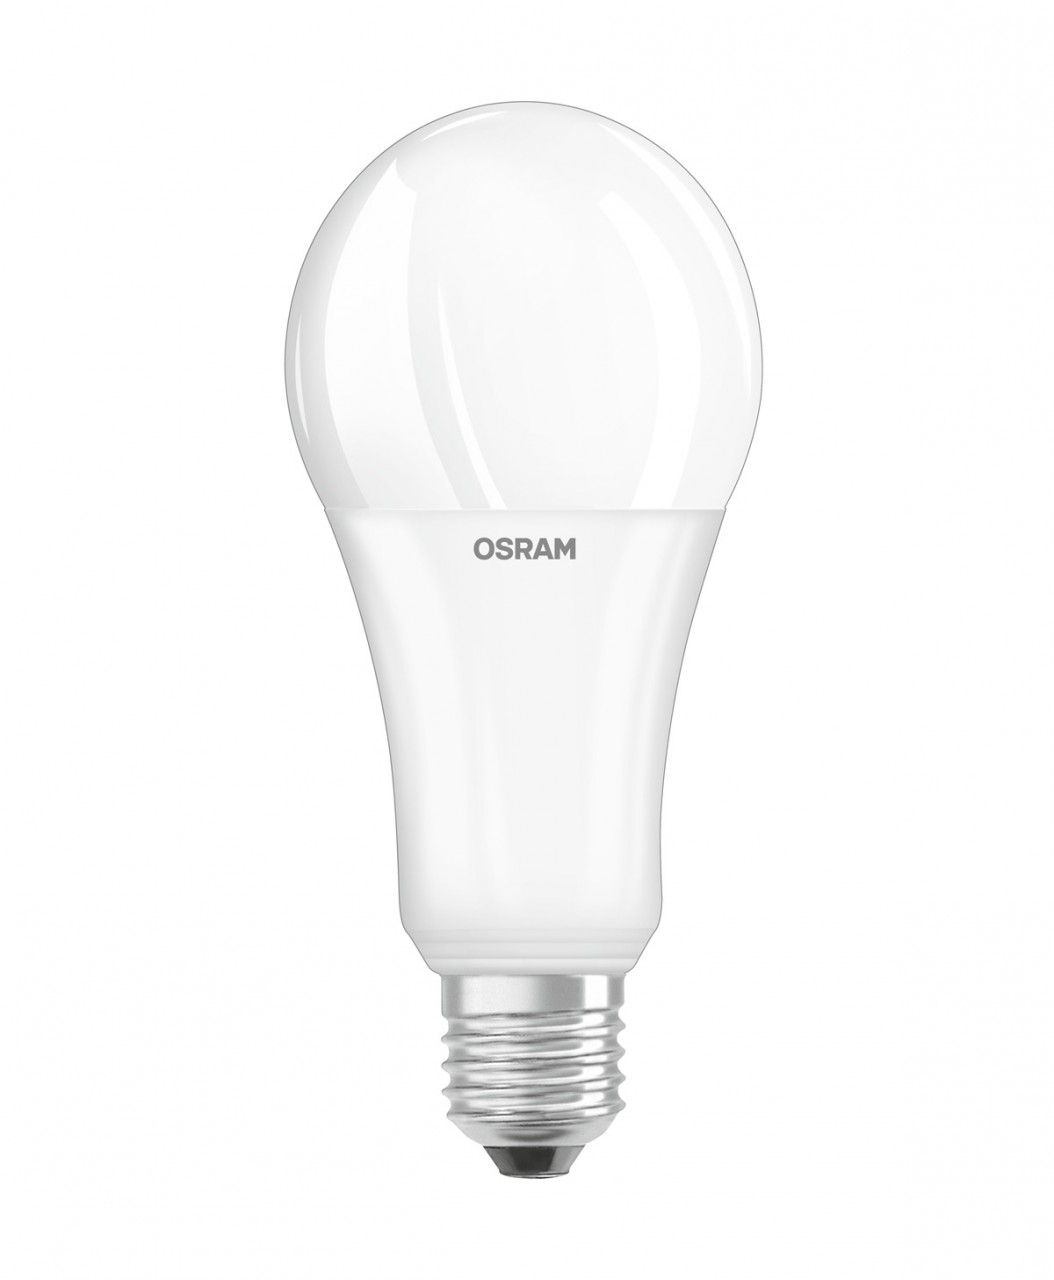 10 Stück E27 LED Leuchtmittel Glühbirne Kugel 3 Watt 240 Lumen warmweiß